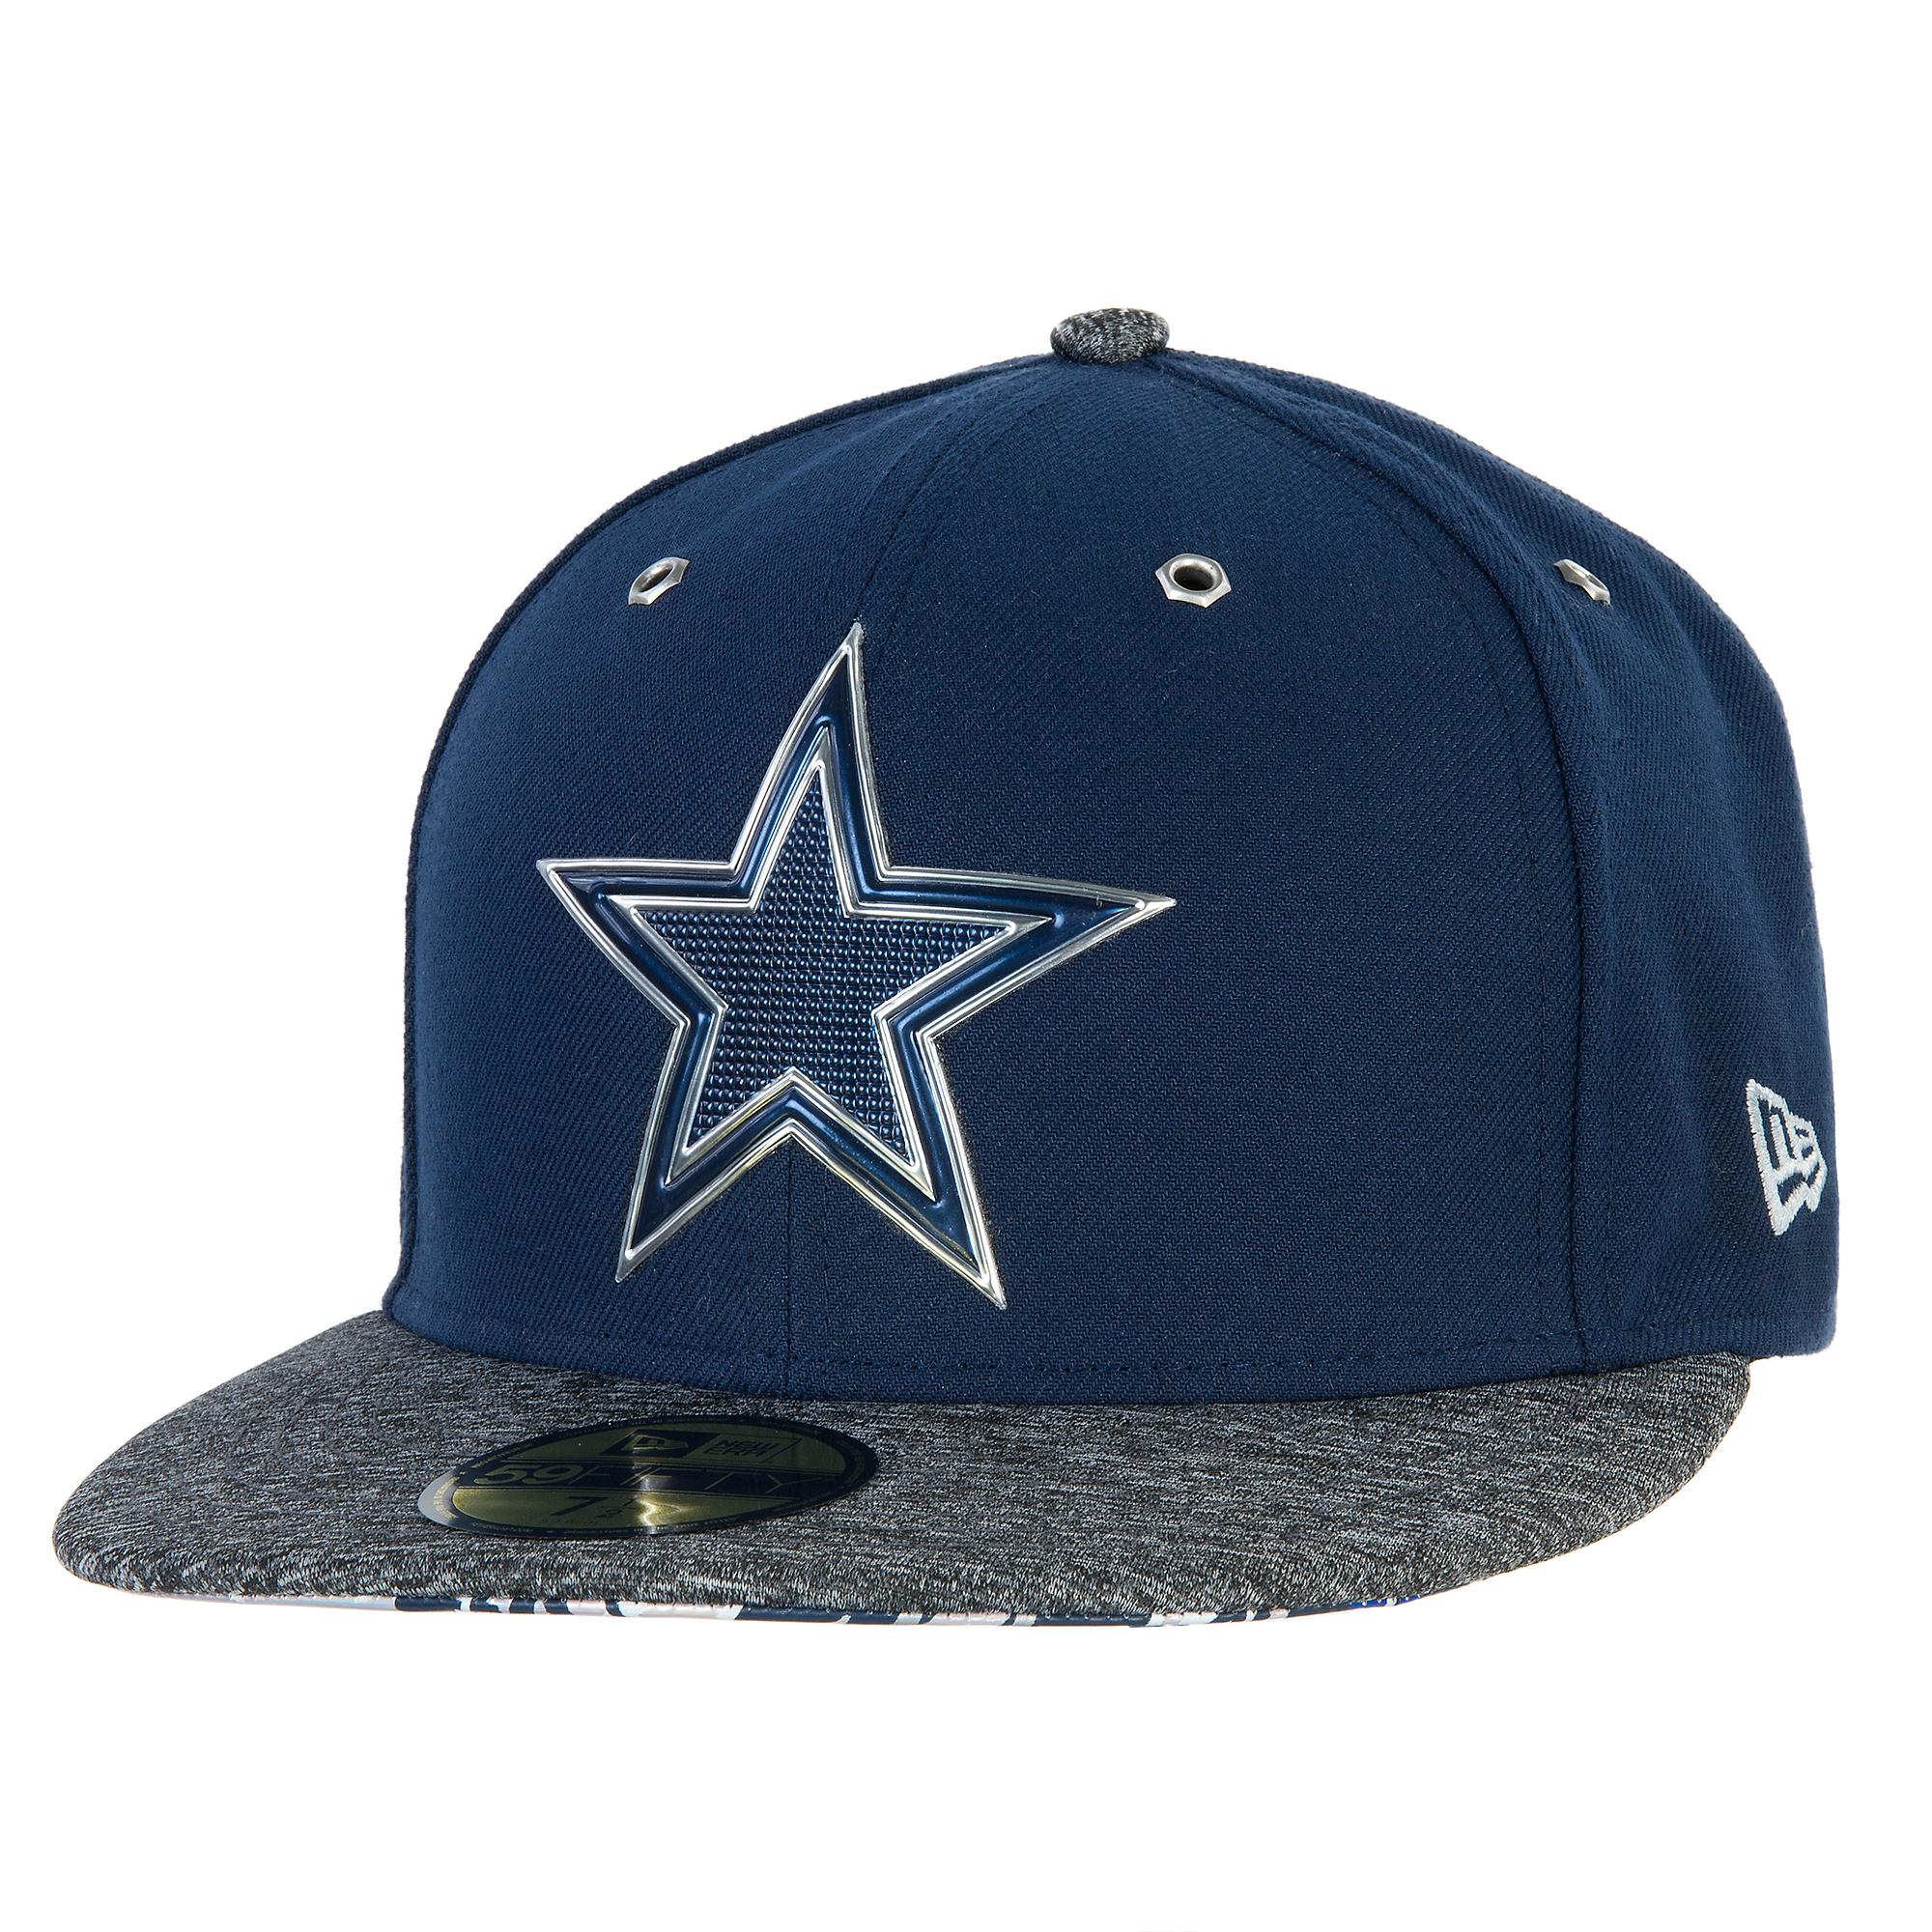 Dallas Cowboys New Era 2016 Mens On Field Draft 59Fifty Cap  02491e05b